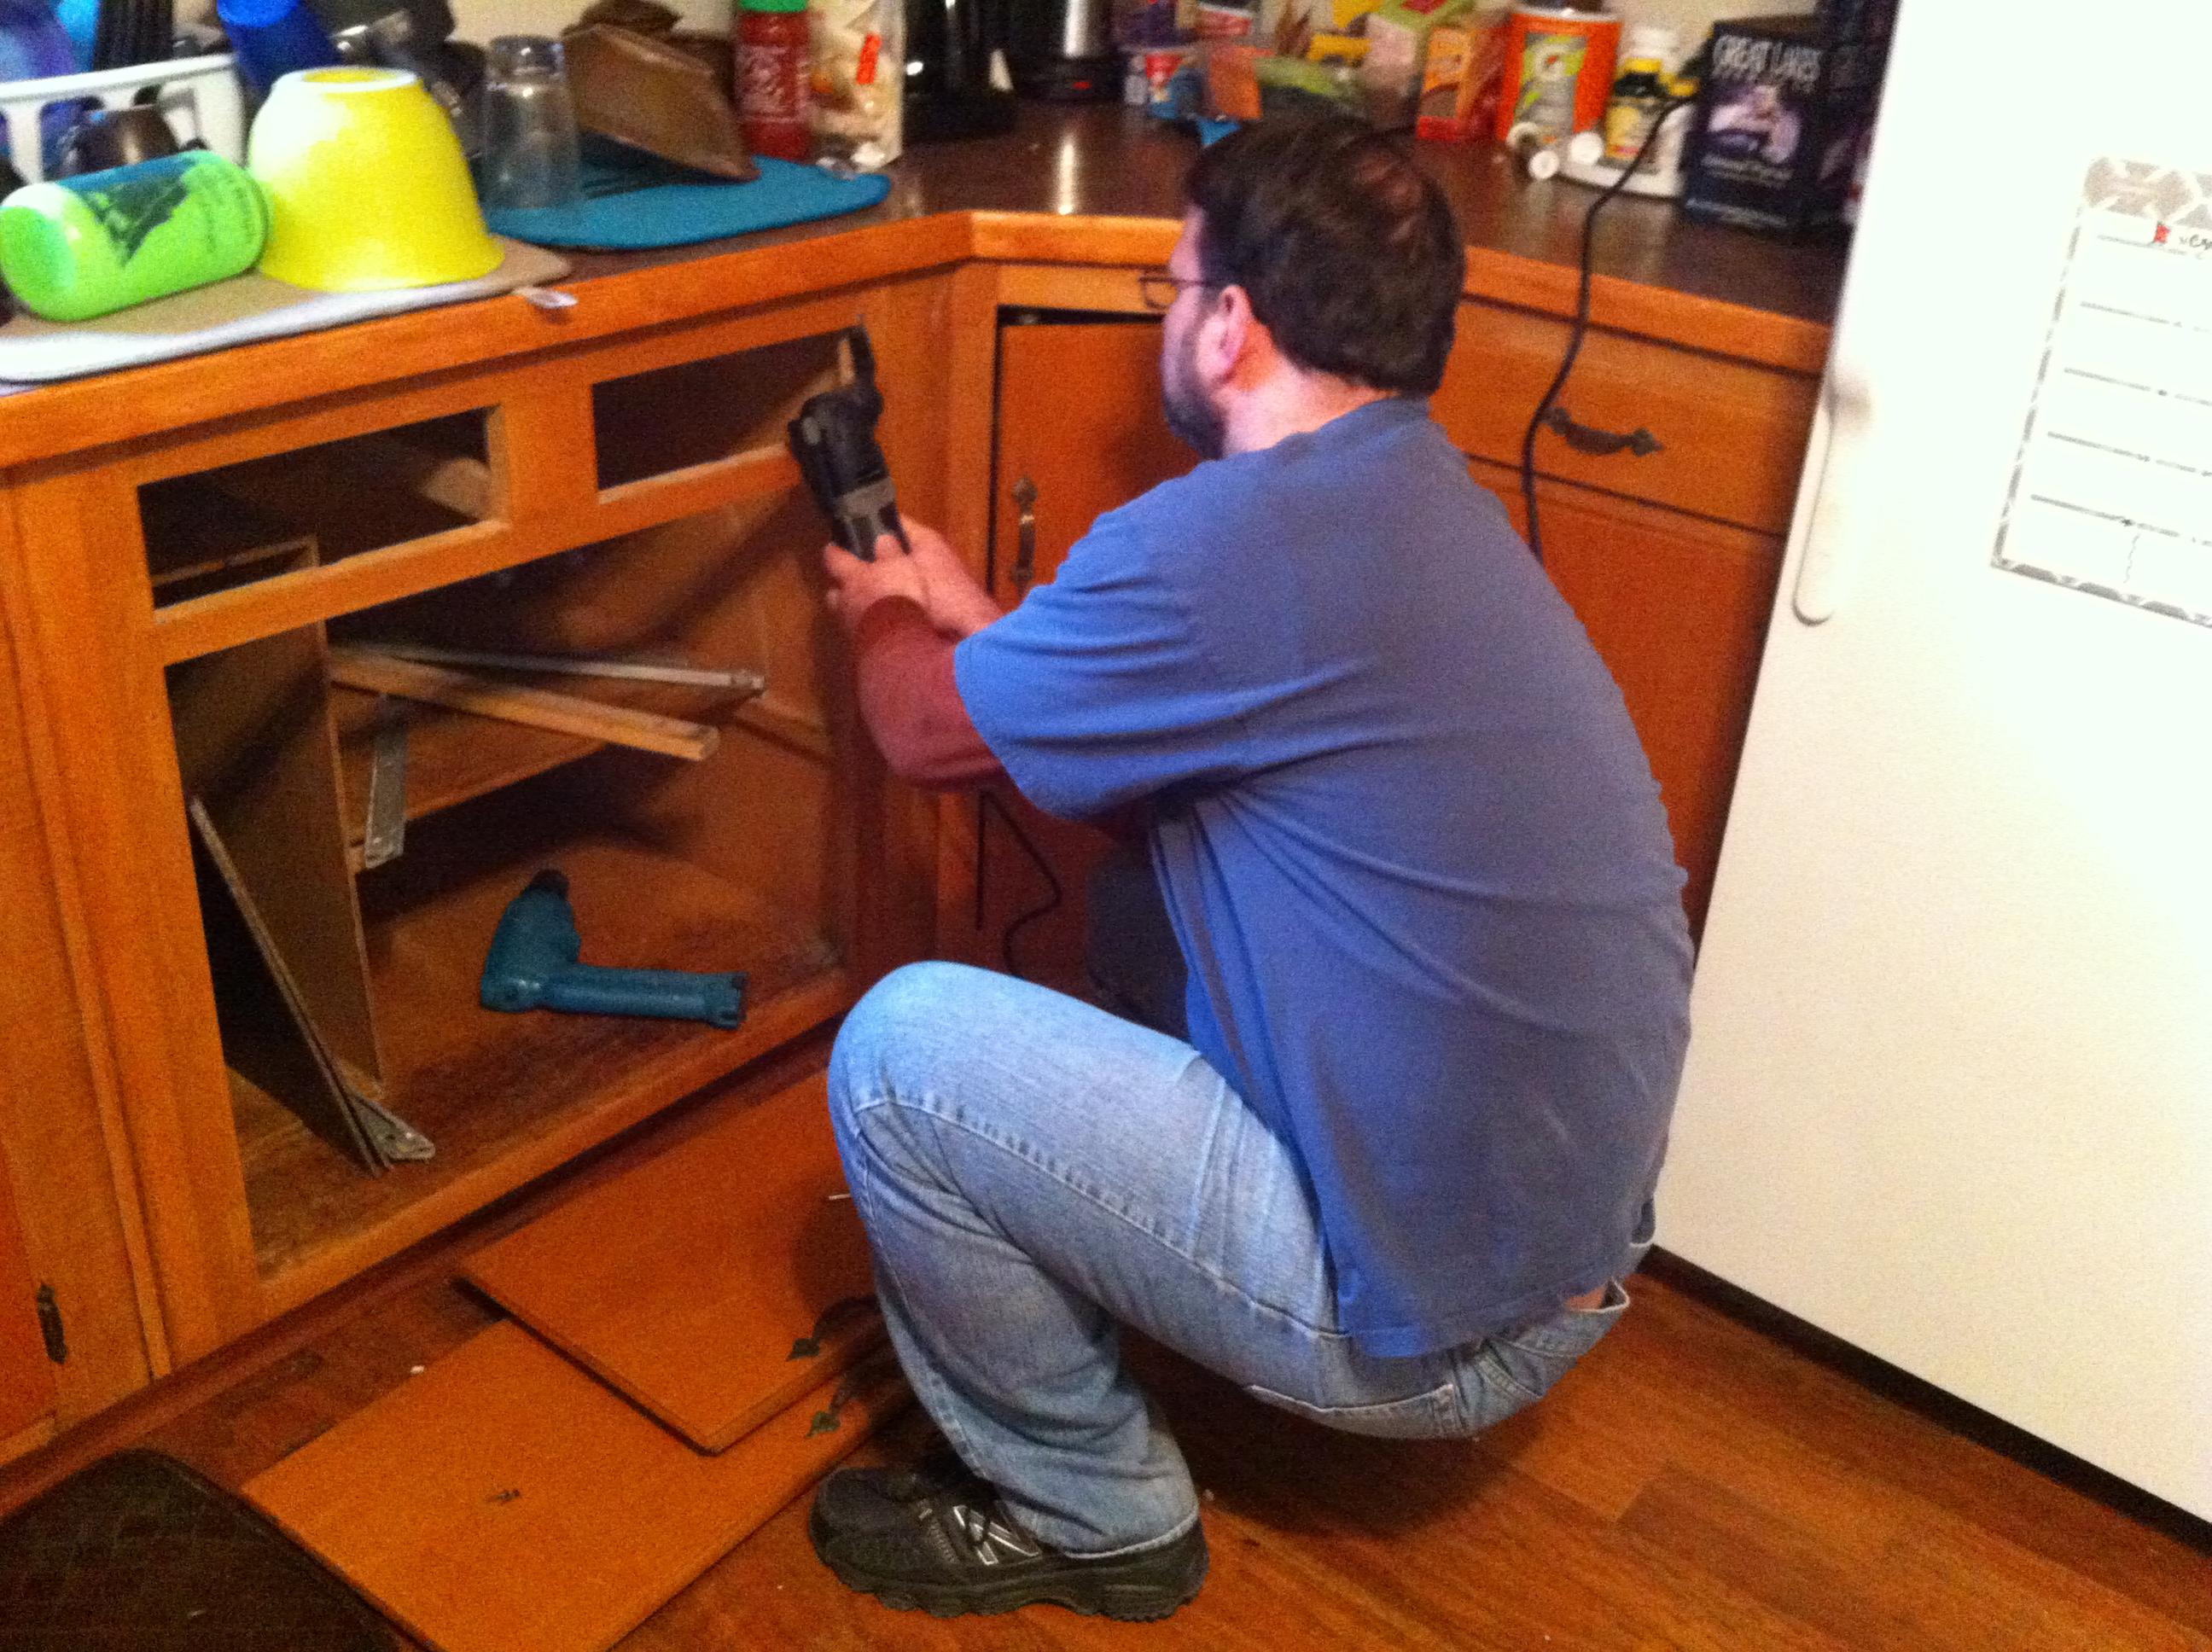 dishwasher | A.Greene's Adventures